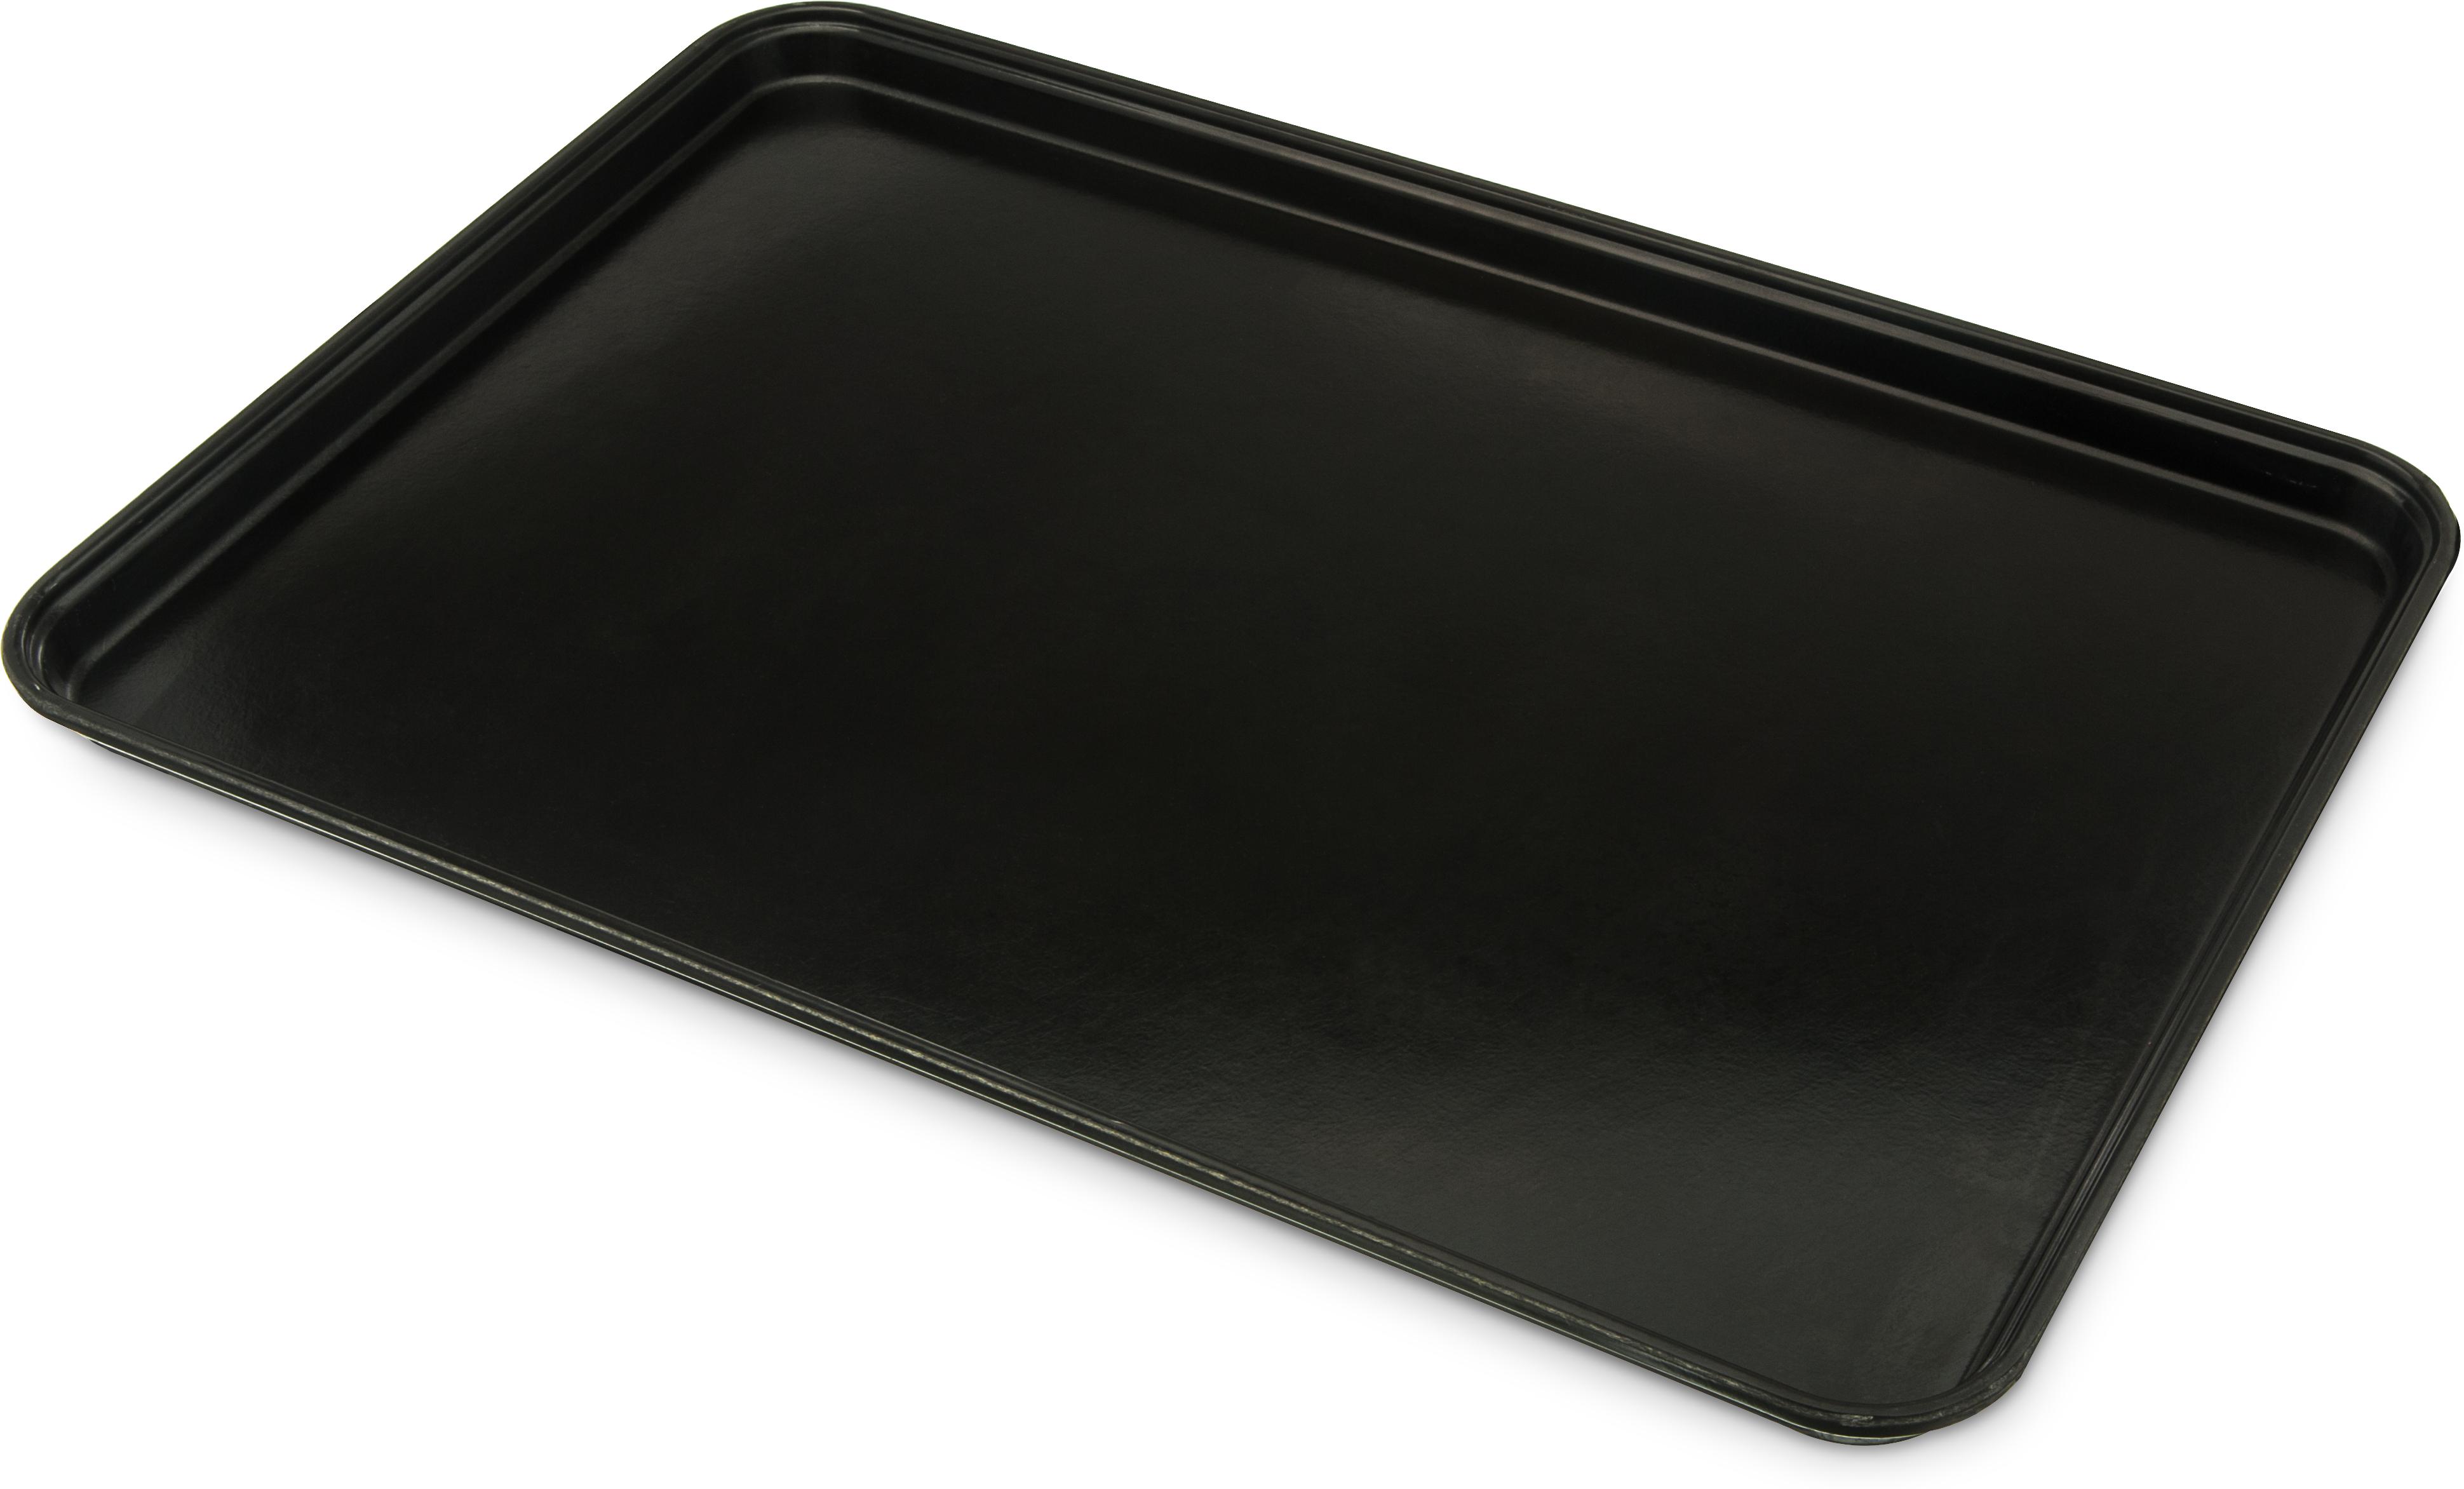 Glasteel Tray Display/Bakery 17.9 x 25.6 - Black